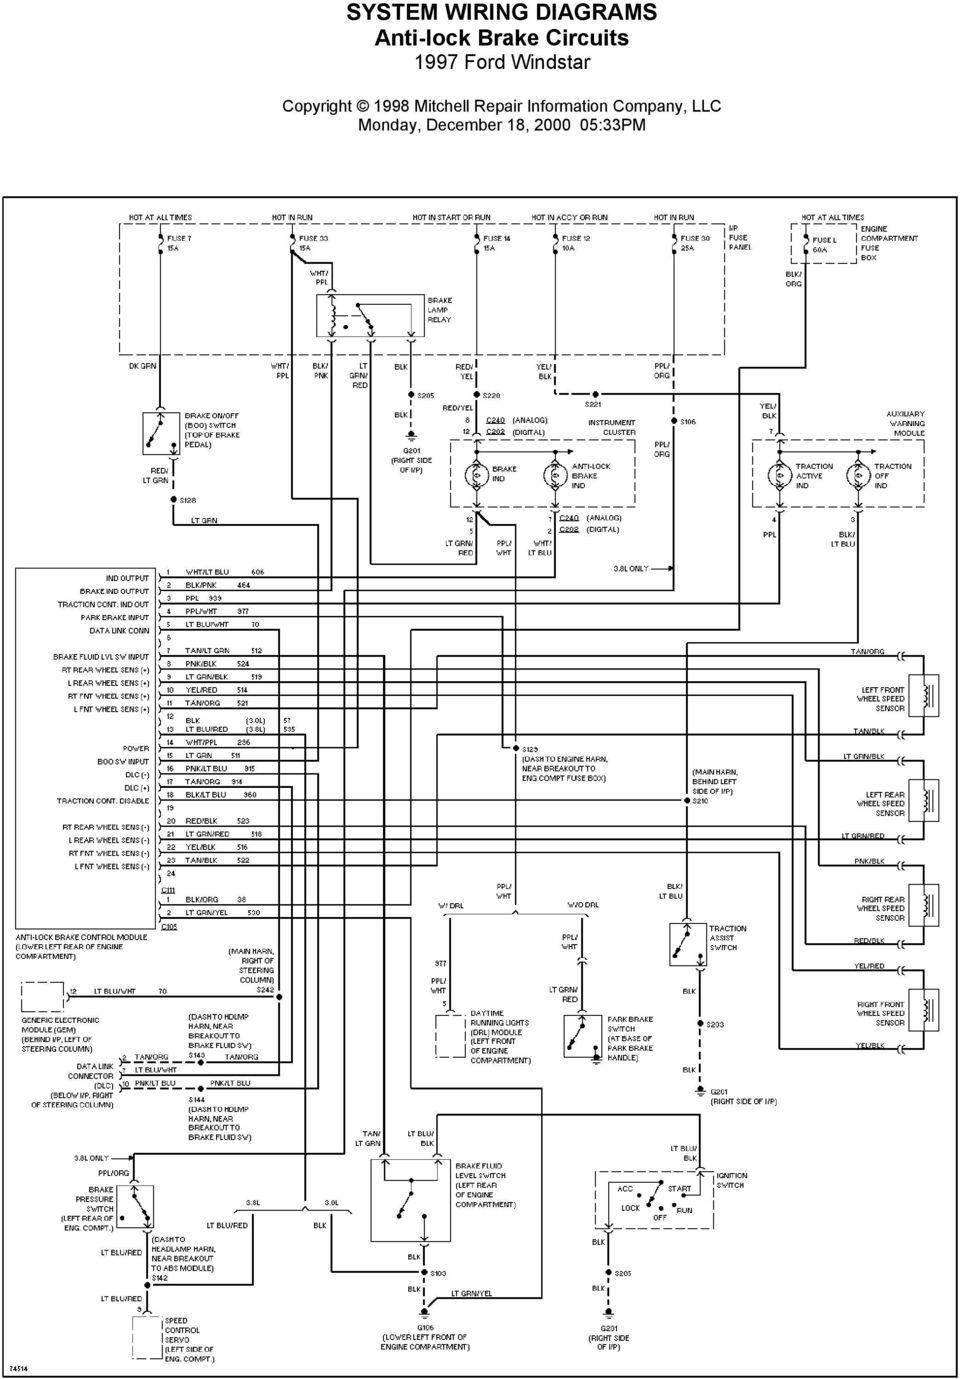 2000 Windstar Wiring Diagram Free Picture Schematic 2002 Bmw 330ci Fuse Box Diagram Source Auto5 Yenpancane Jeanjaures37 Fr